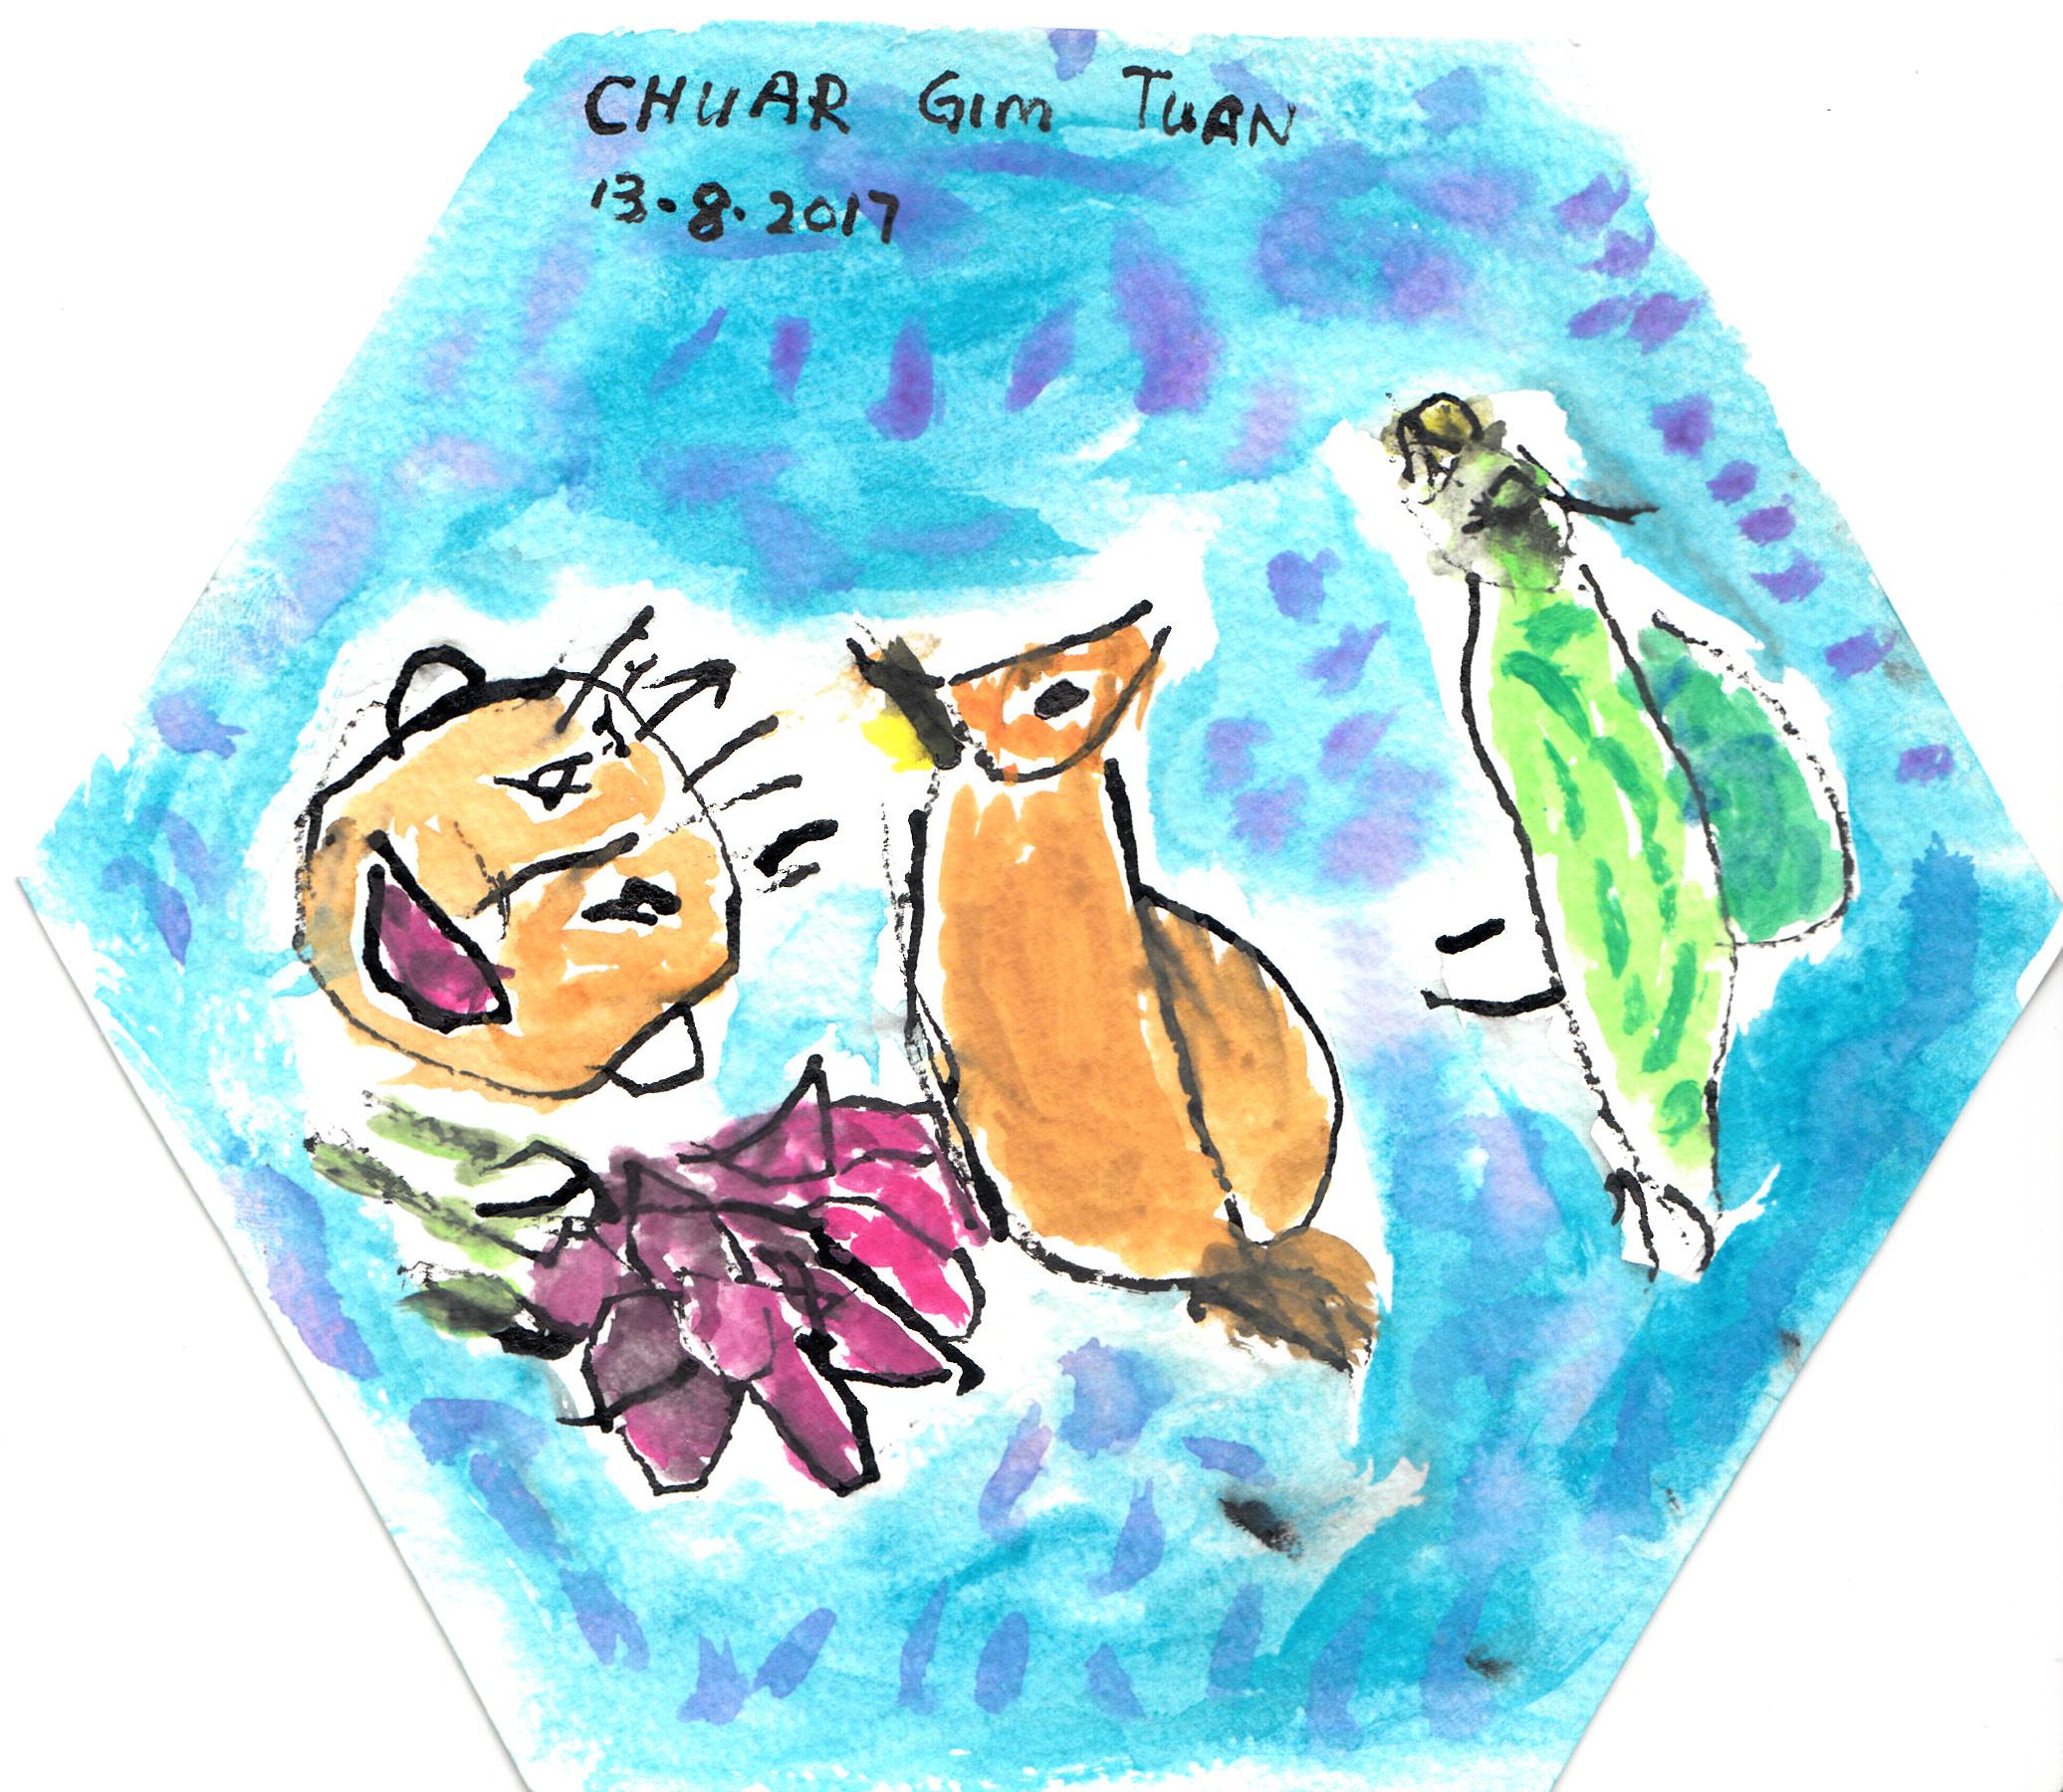 Chuar Gim Thuan 07.jpg